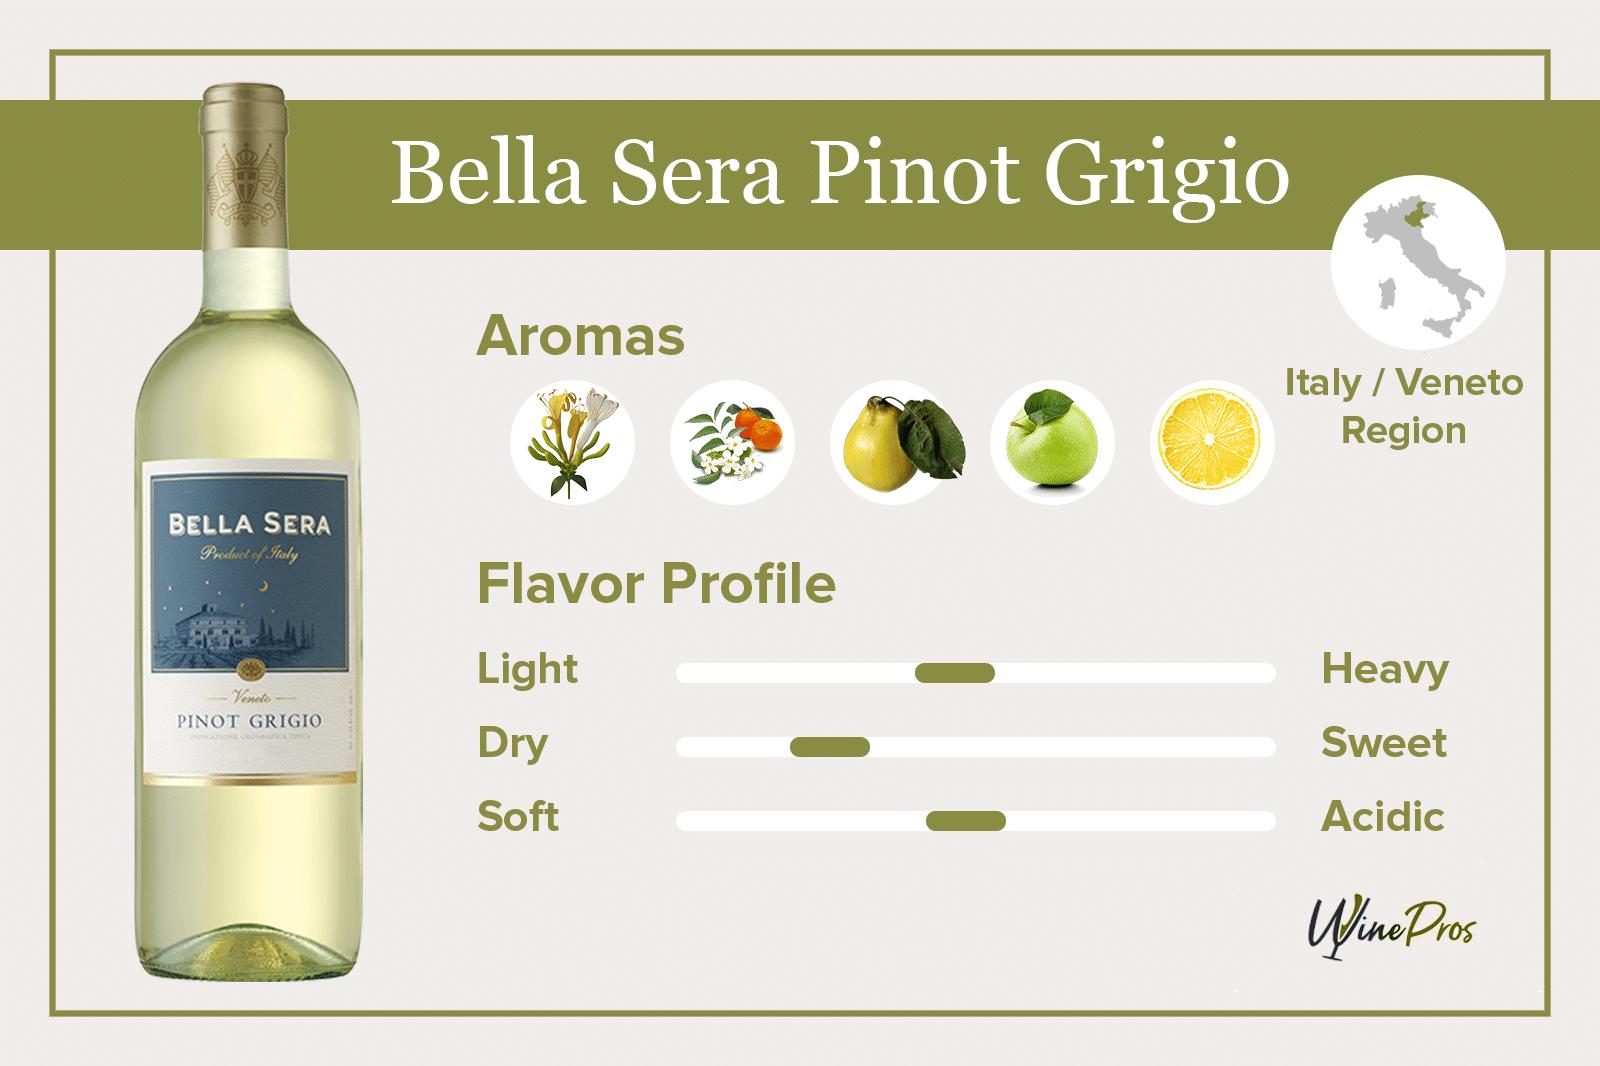 Bella Sera Pinot Grigio Review (2021)